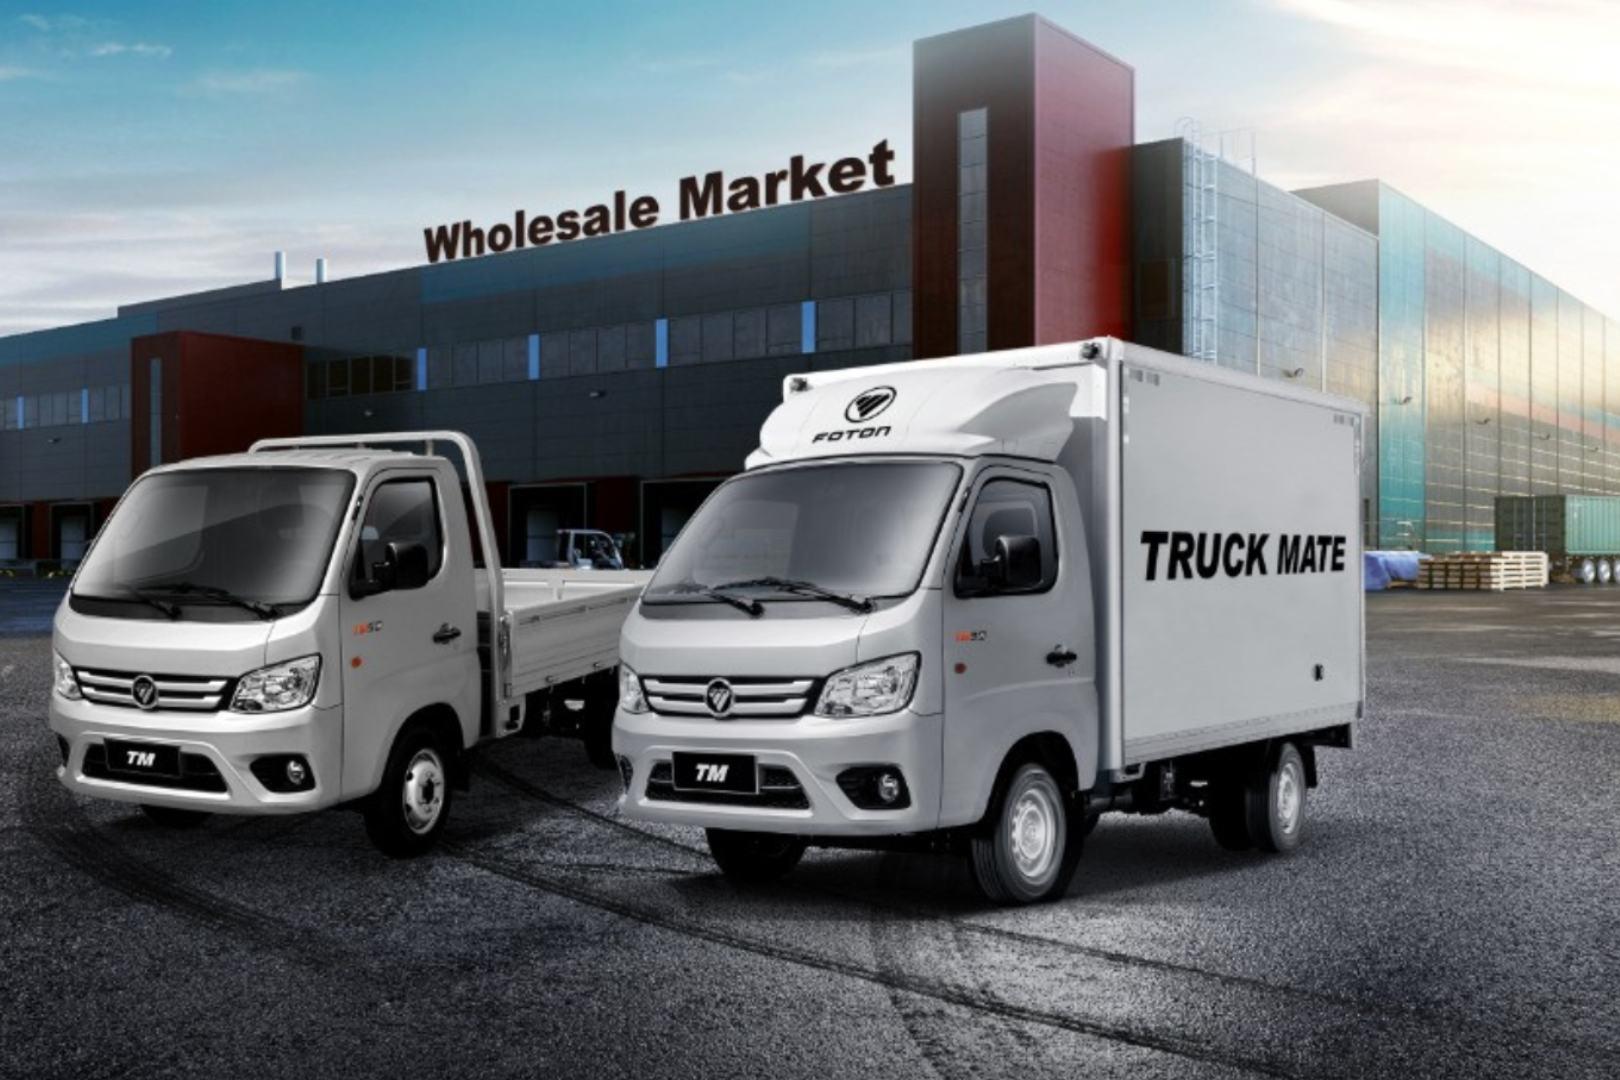 Truck Mate (TM), Foton México, Logística, Reparto, Ligeros